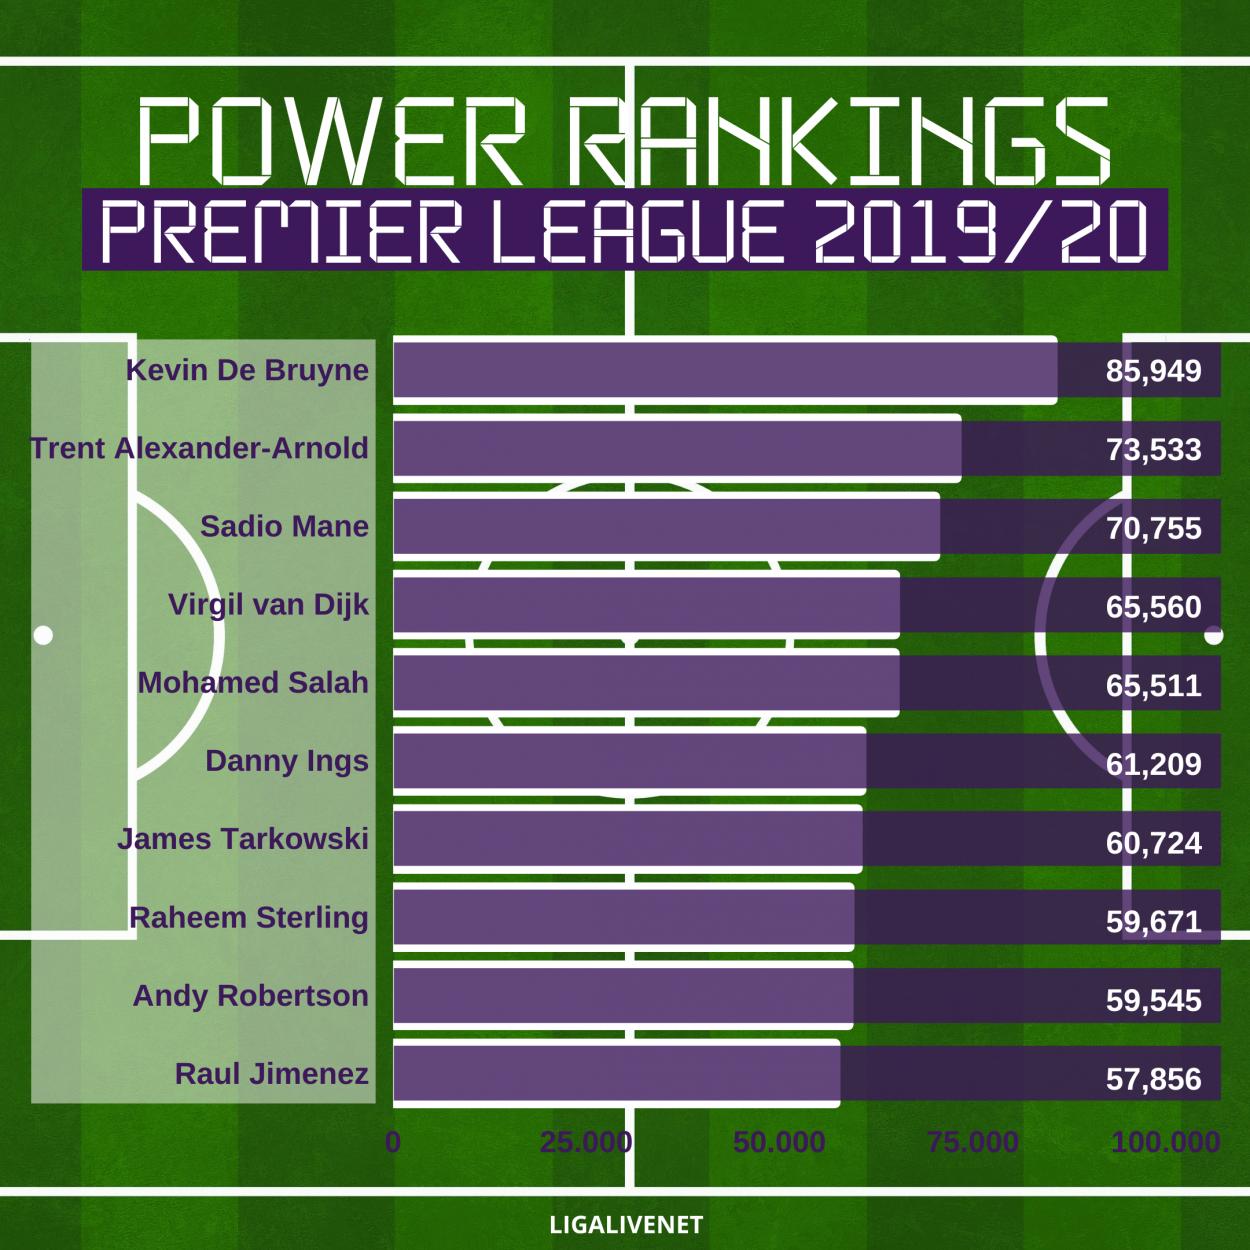 Power Rankings Premier League 2019/20 table